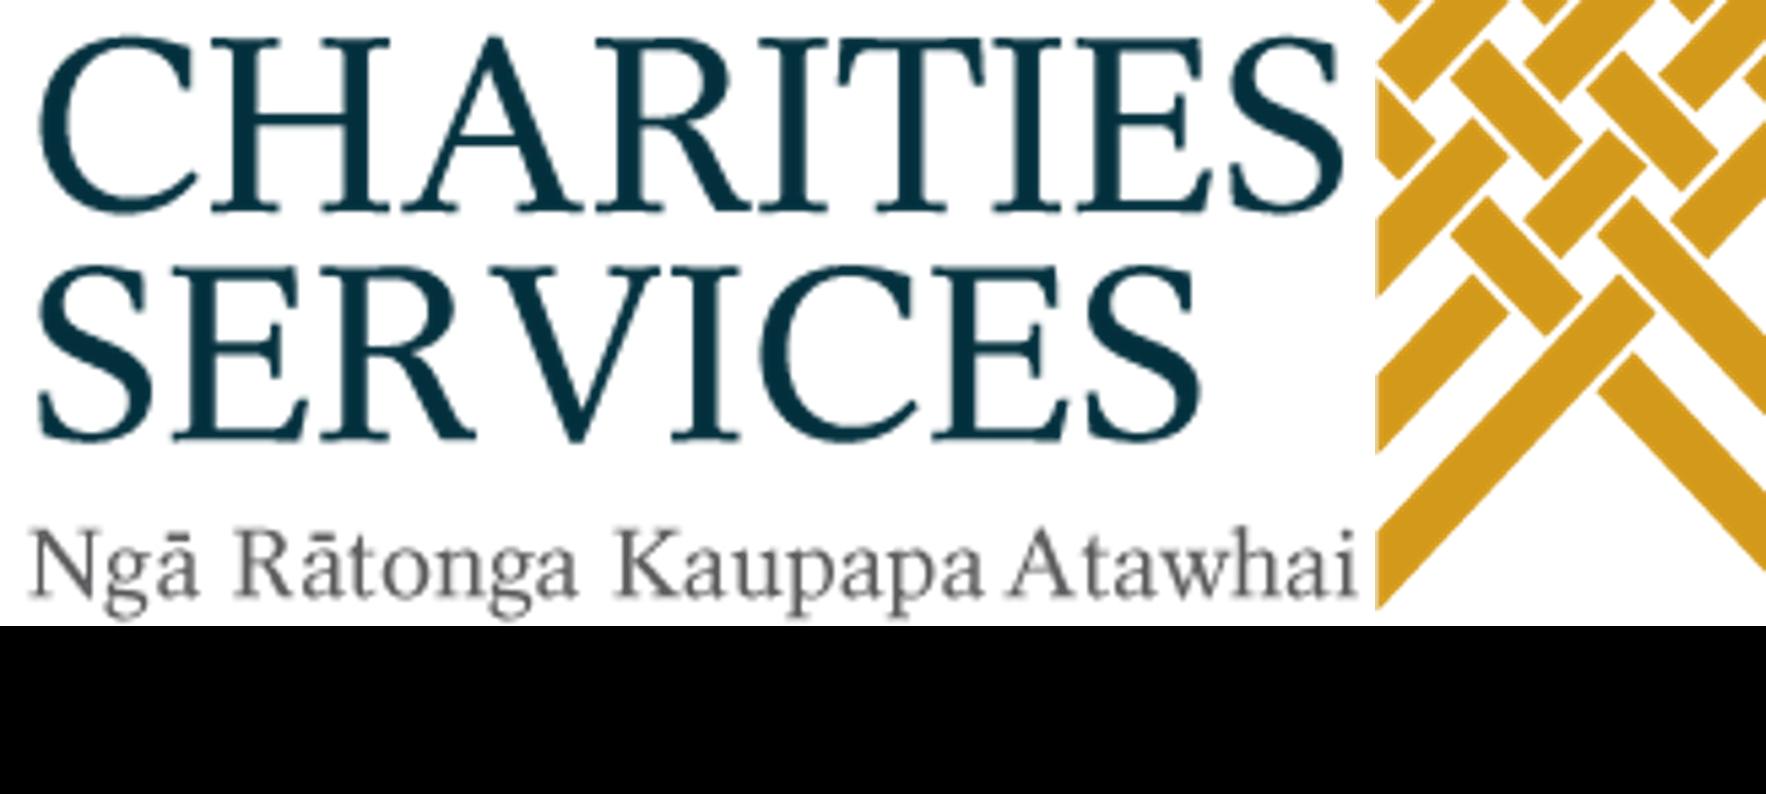 charitiesserviceslogo.png